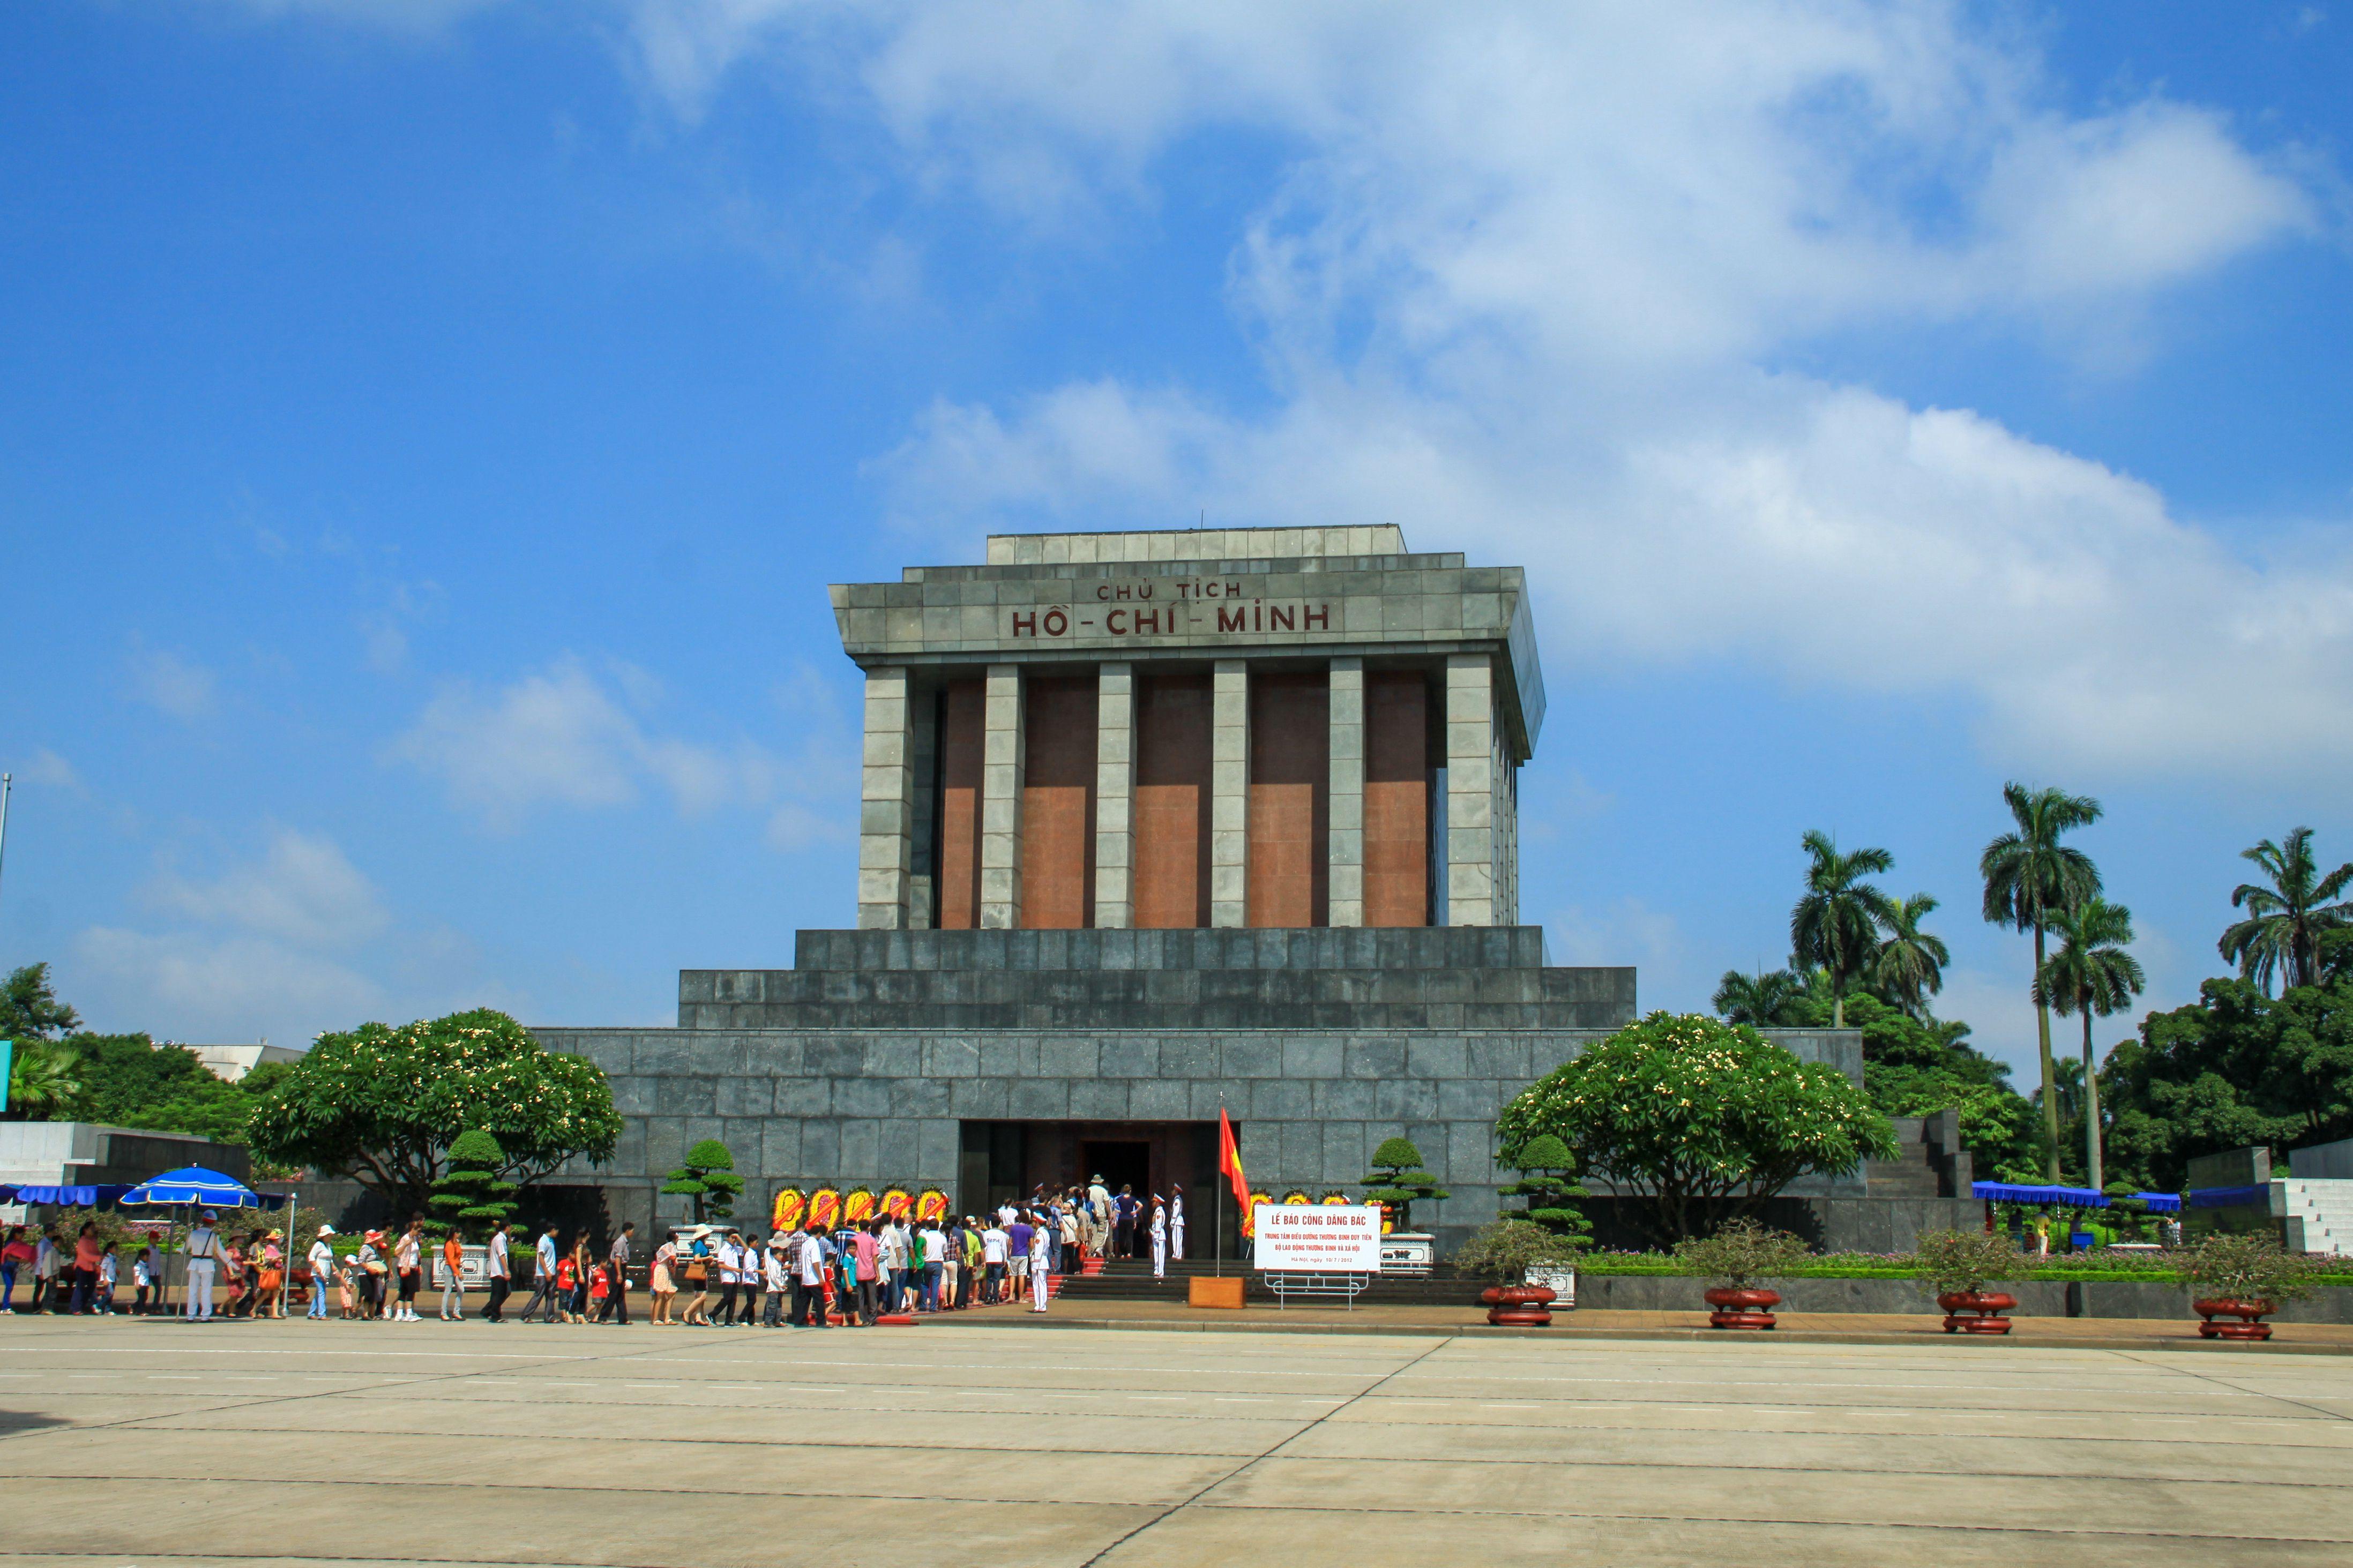 The Top 13 Things to Do in Hanoi, Vietnam